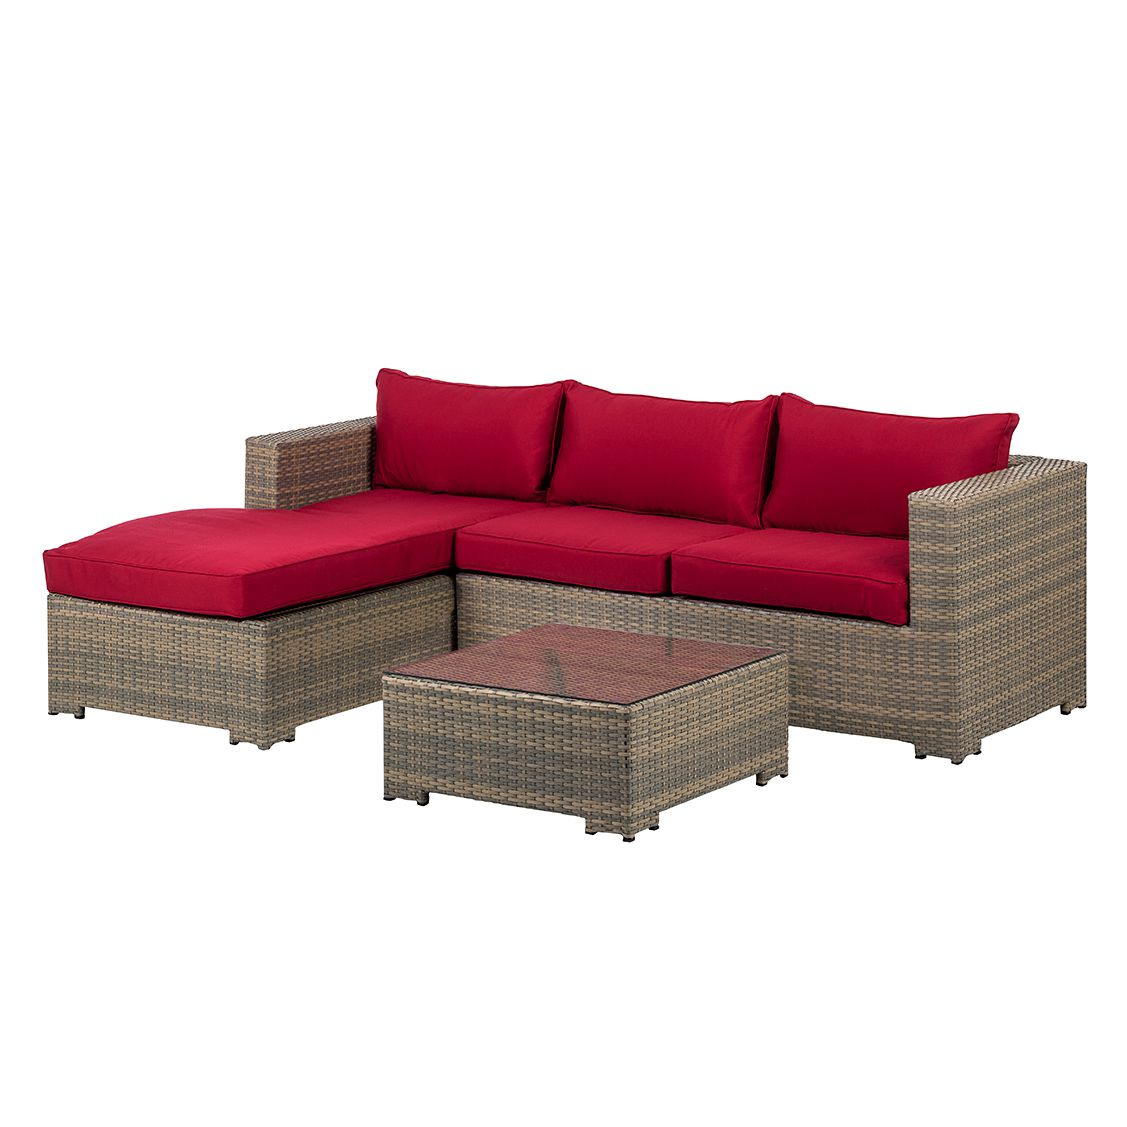 Home 24 - Canapé lounge paradise lounge (2 éléments) - polyrotin anthracite / rouge, fredriks